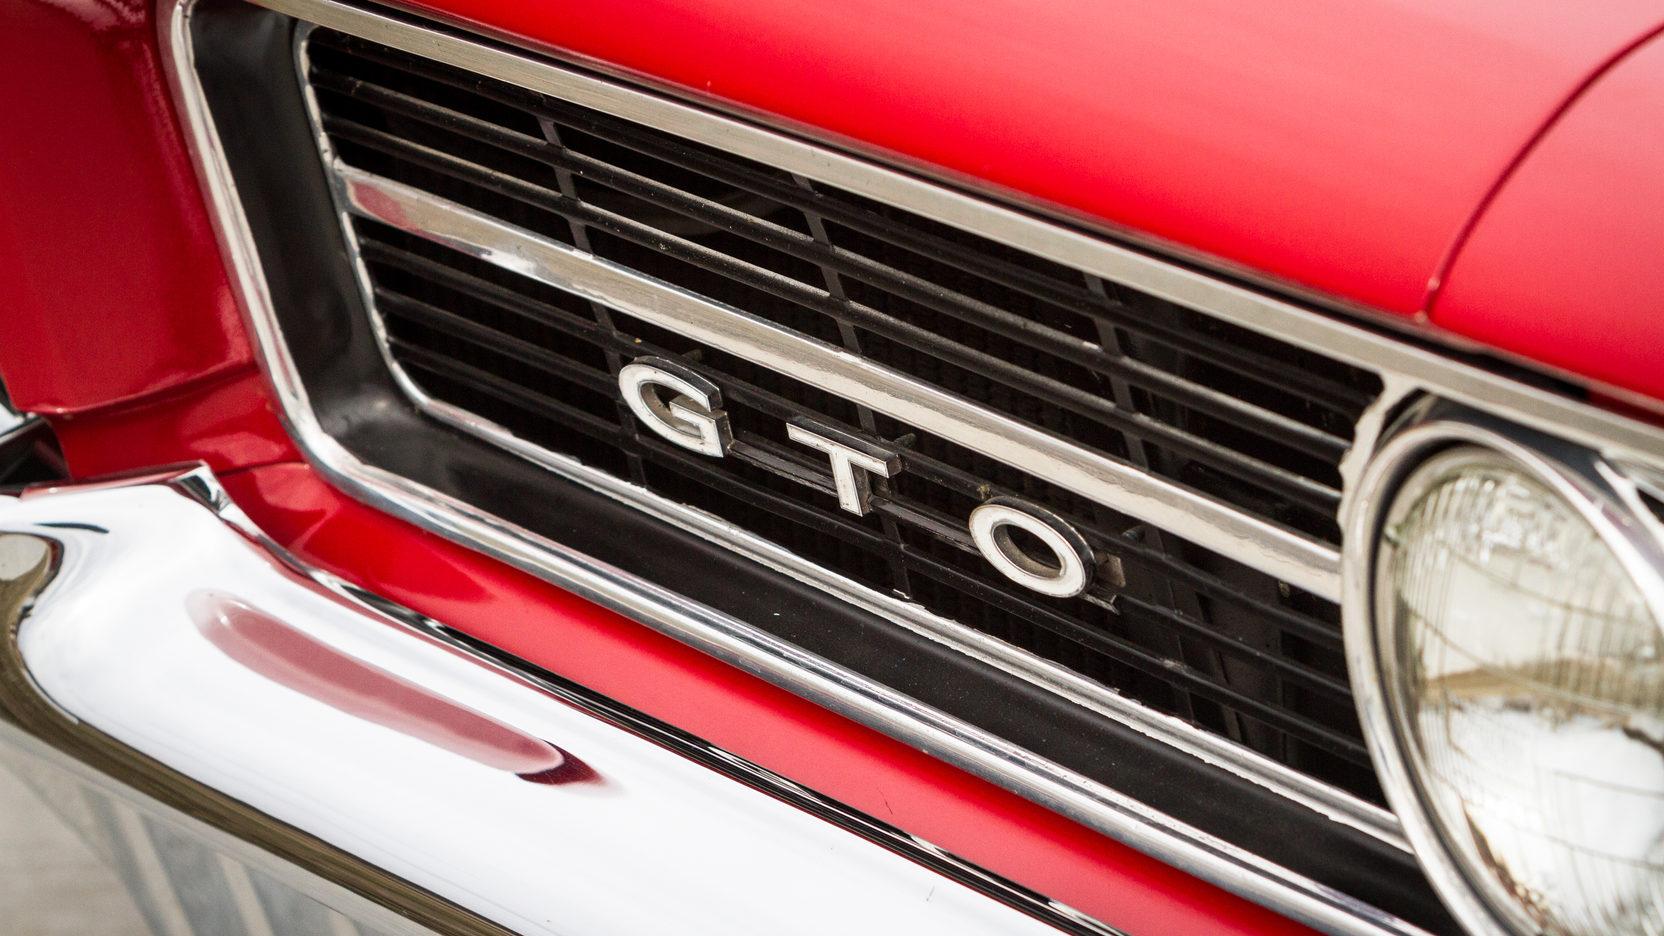 1964 Pontiac LeMans GTO badge grill